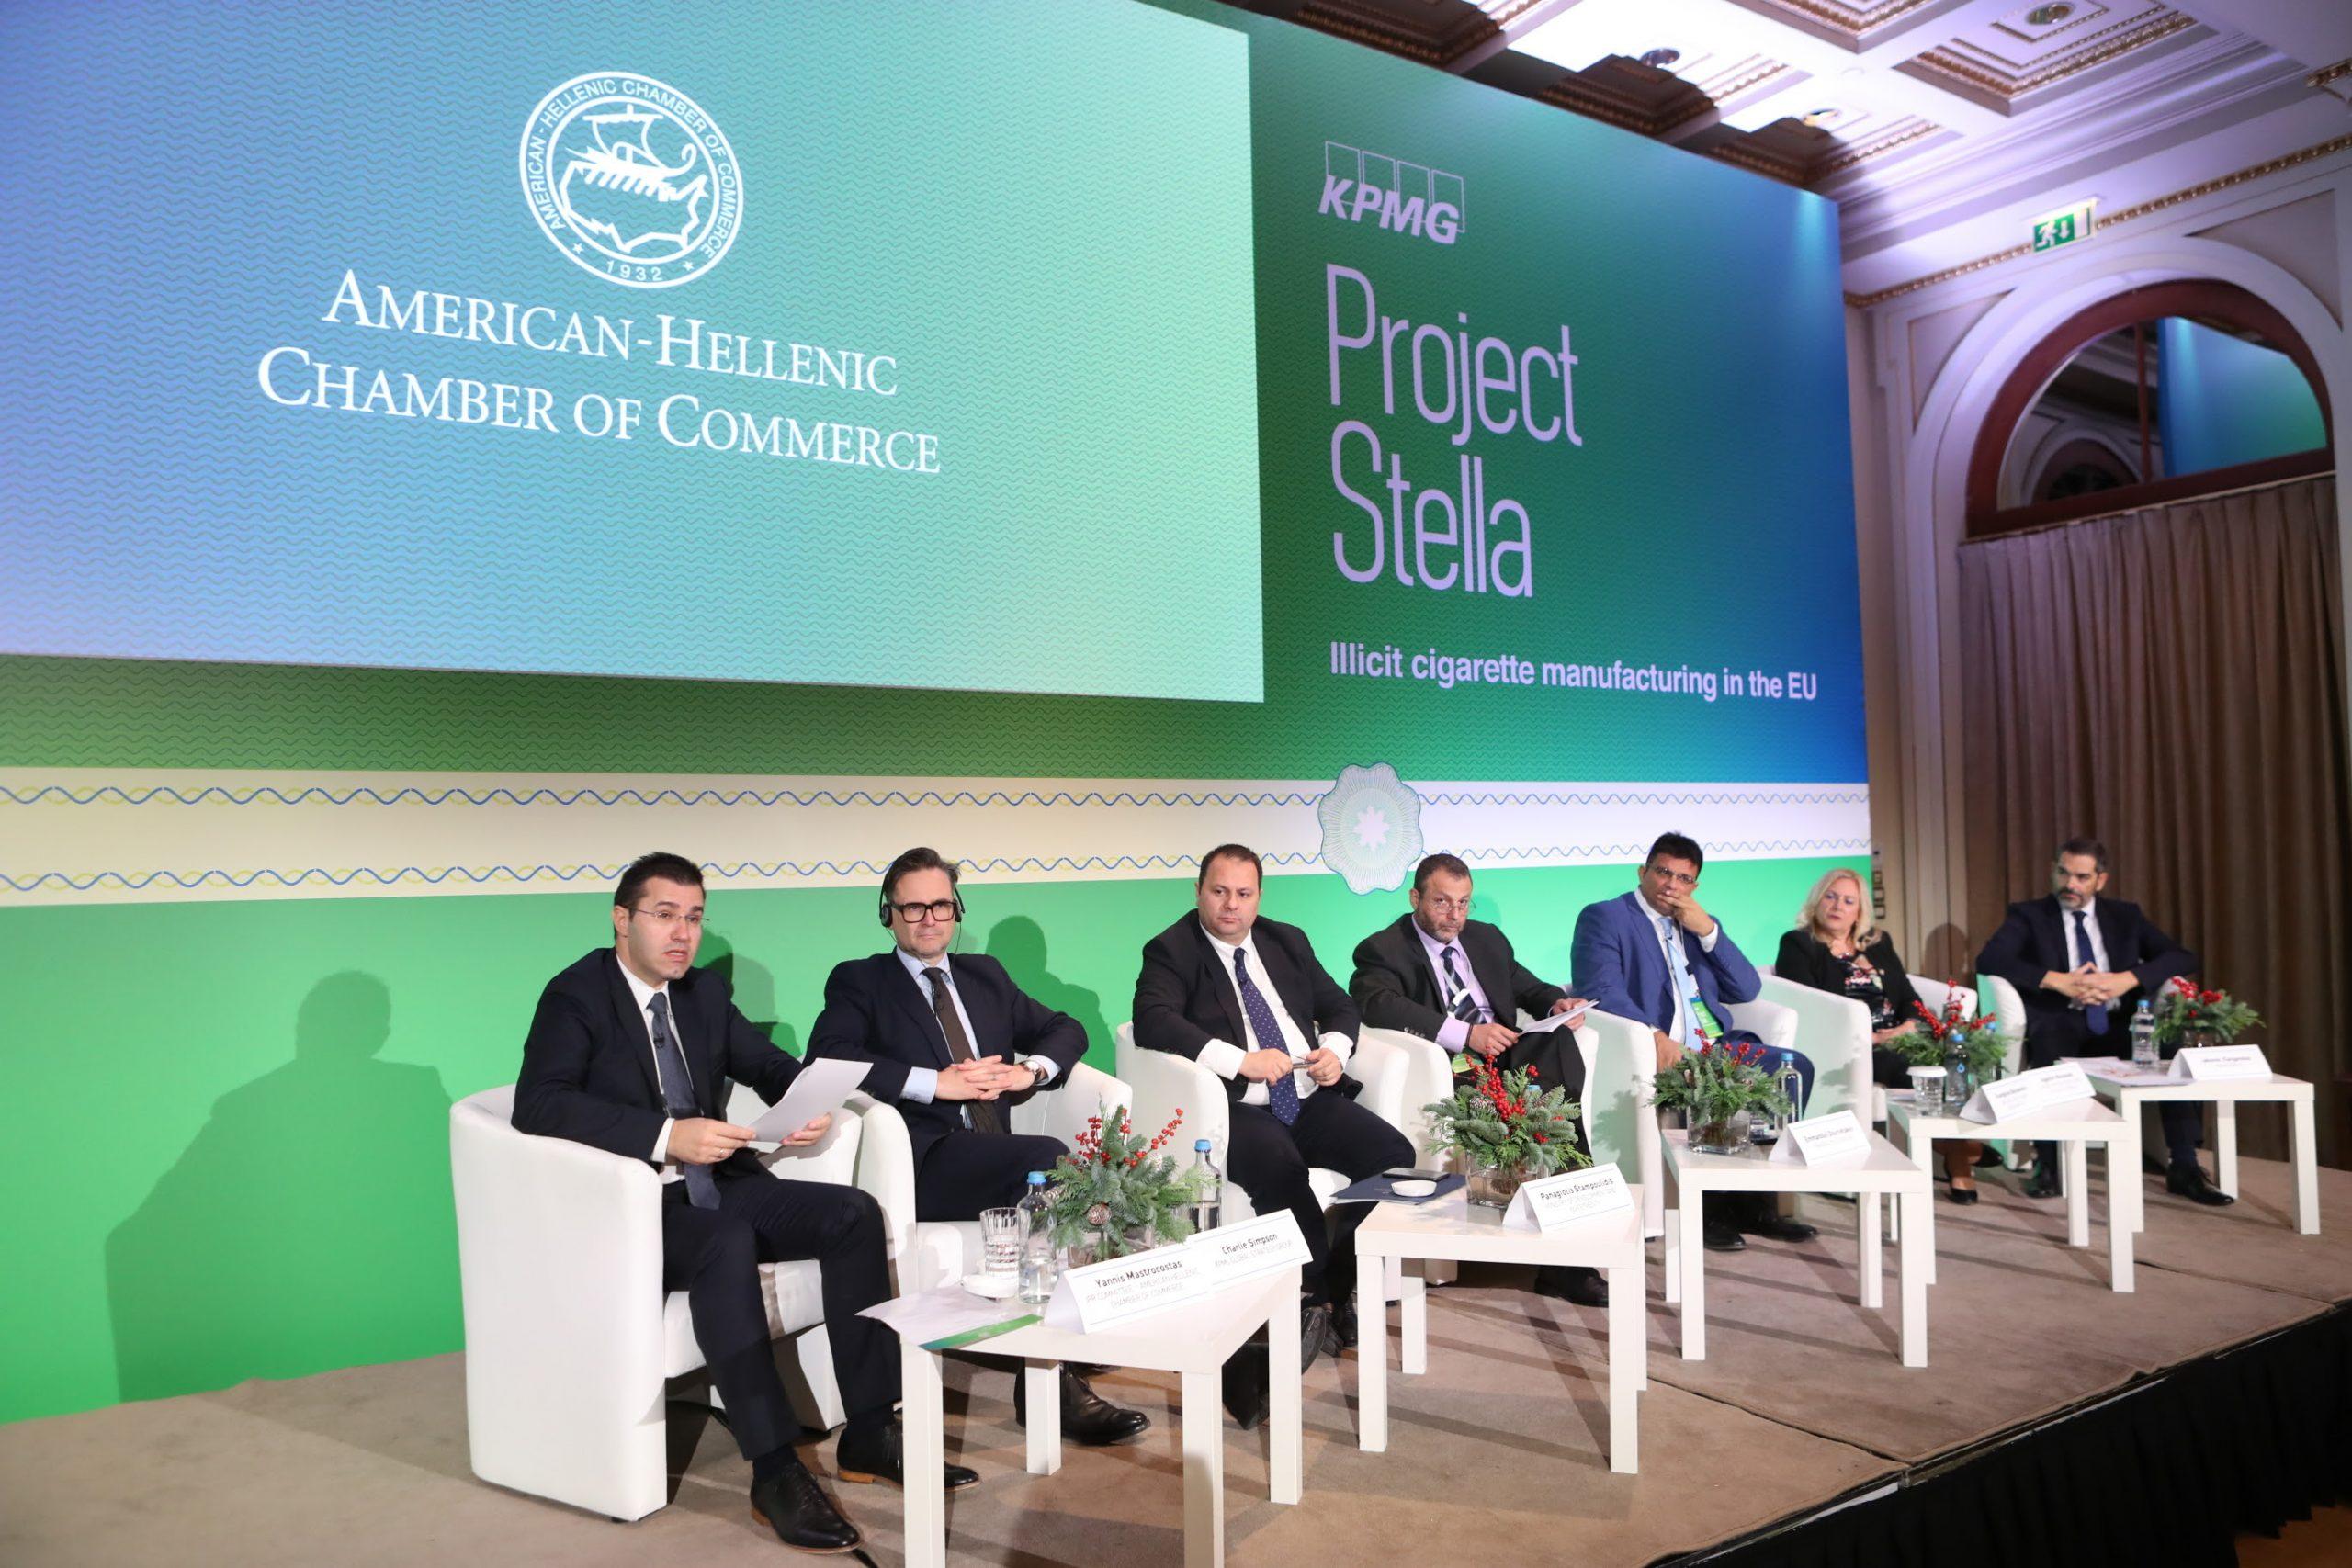 Tο Ελληνο-Αμερικανικό Εμπορικό Επιμελητήριο διοργάνωσε συνέδριο σχετικά με το παράνομο εμπόριο τσιγάρων